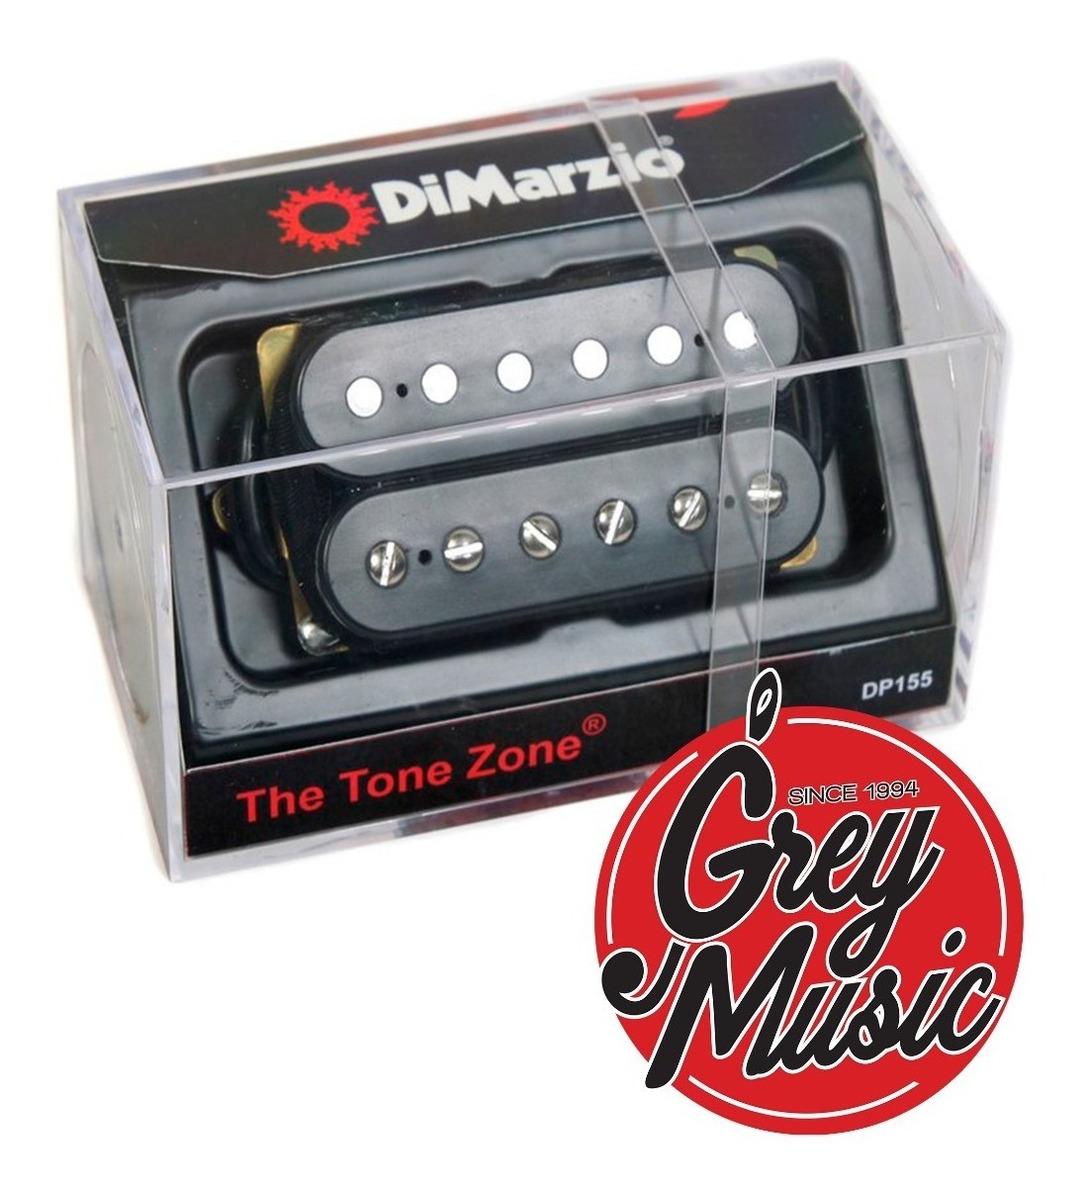 Micrófono Dimarzio Dp155-bk The Tone Zone - Grey Music